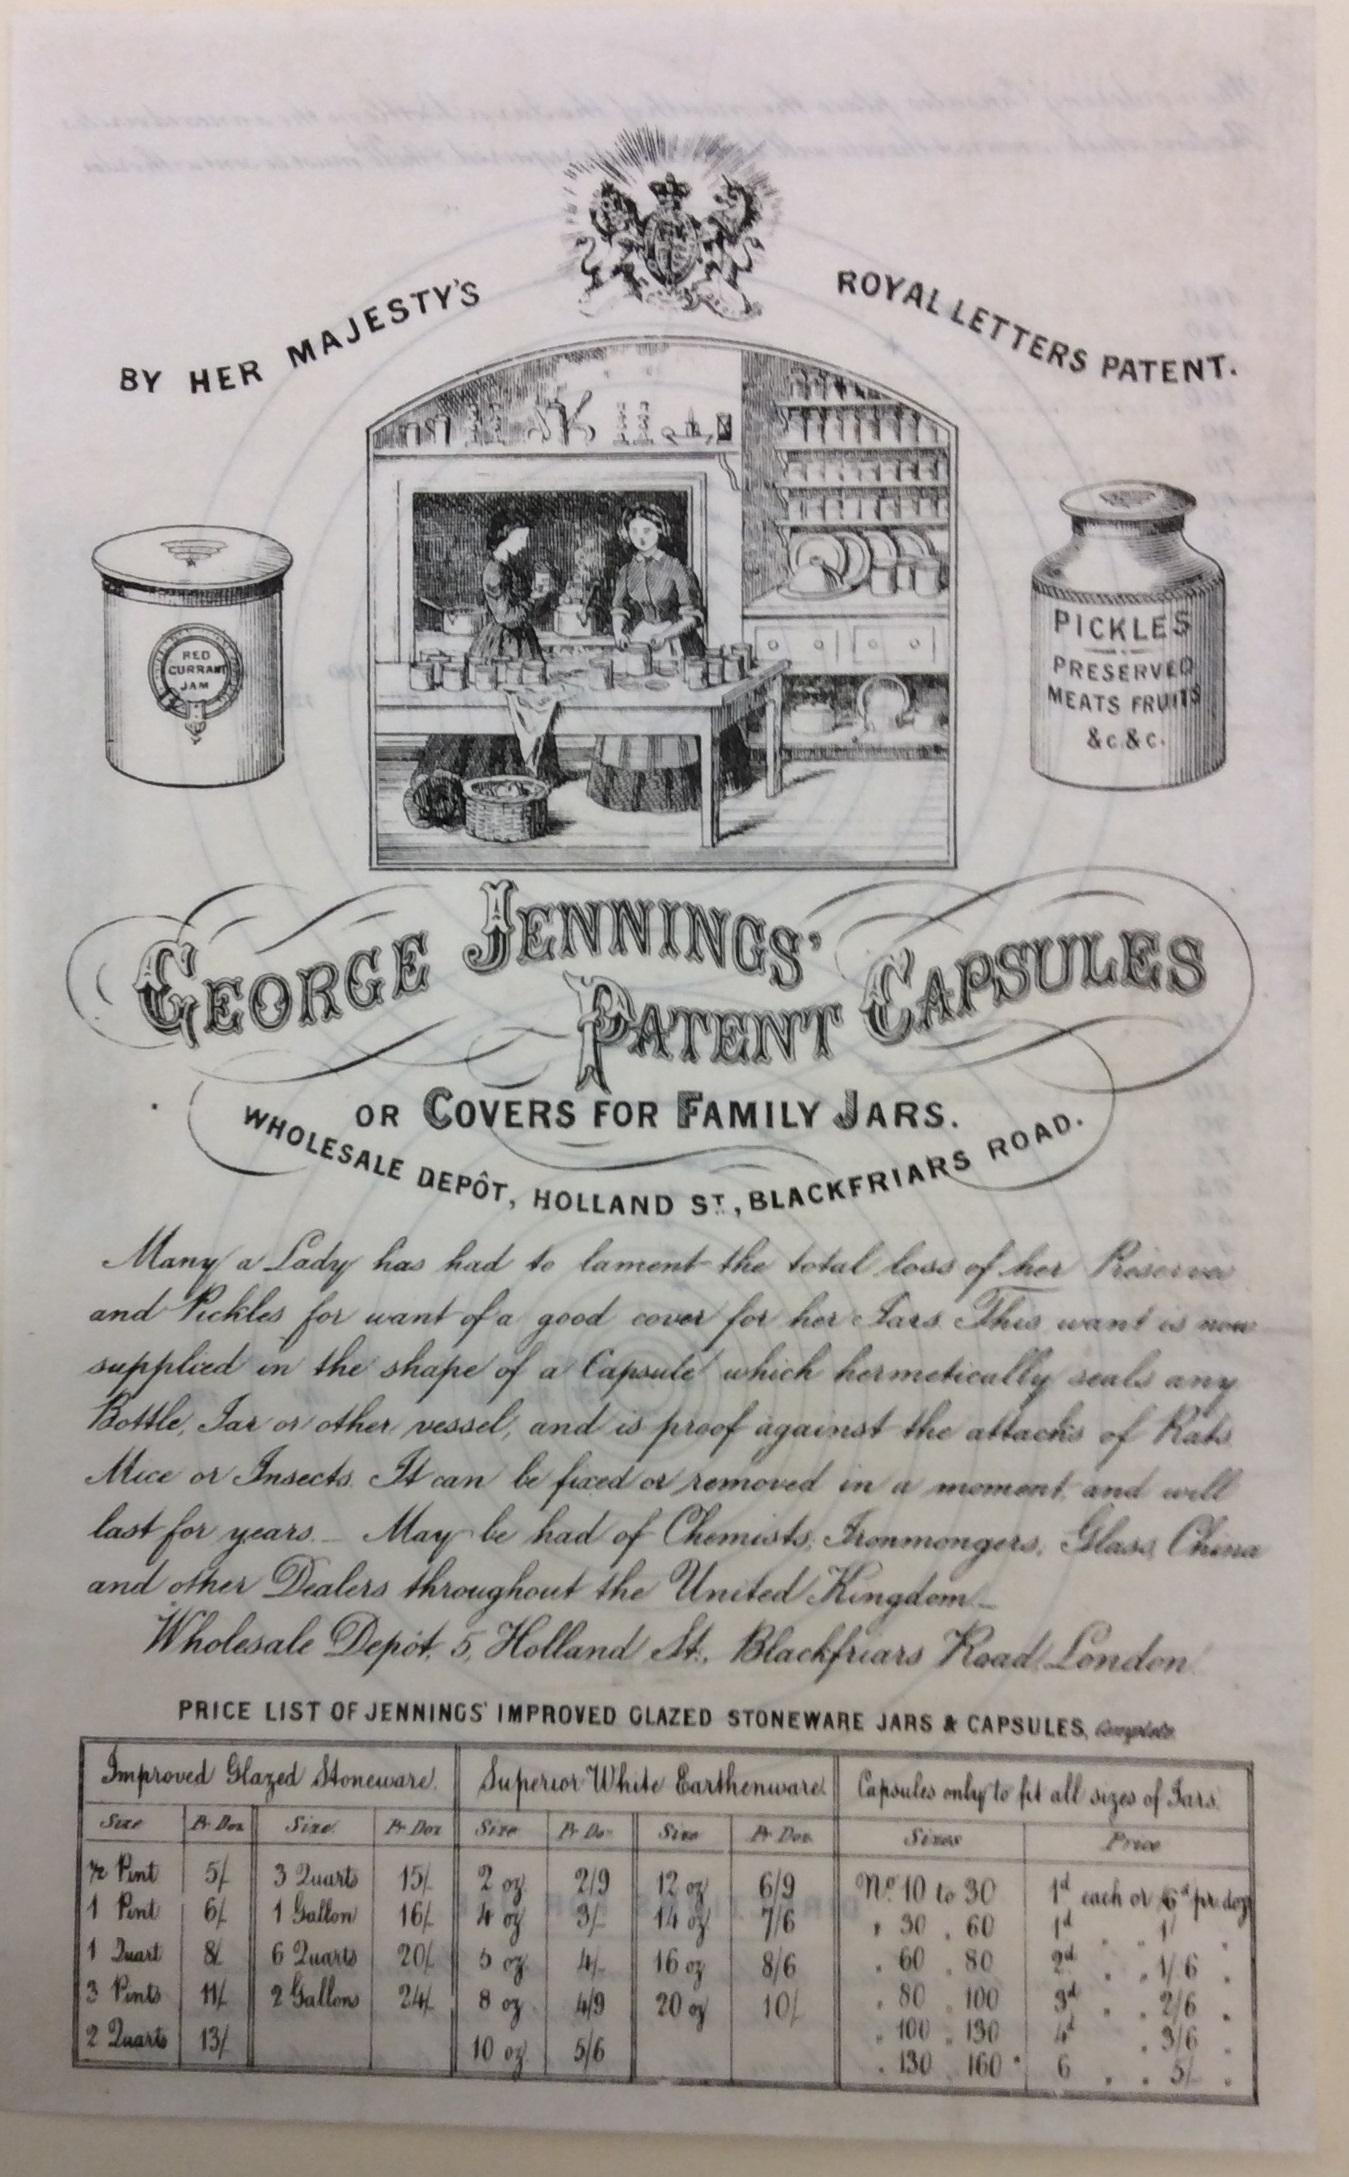 Jennings patent capsules.